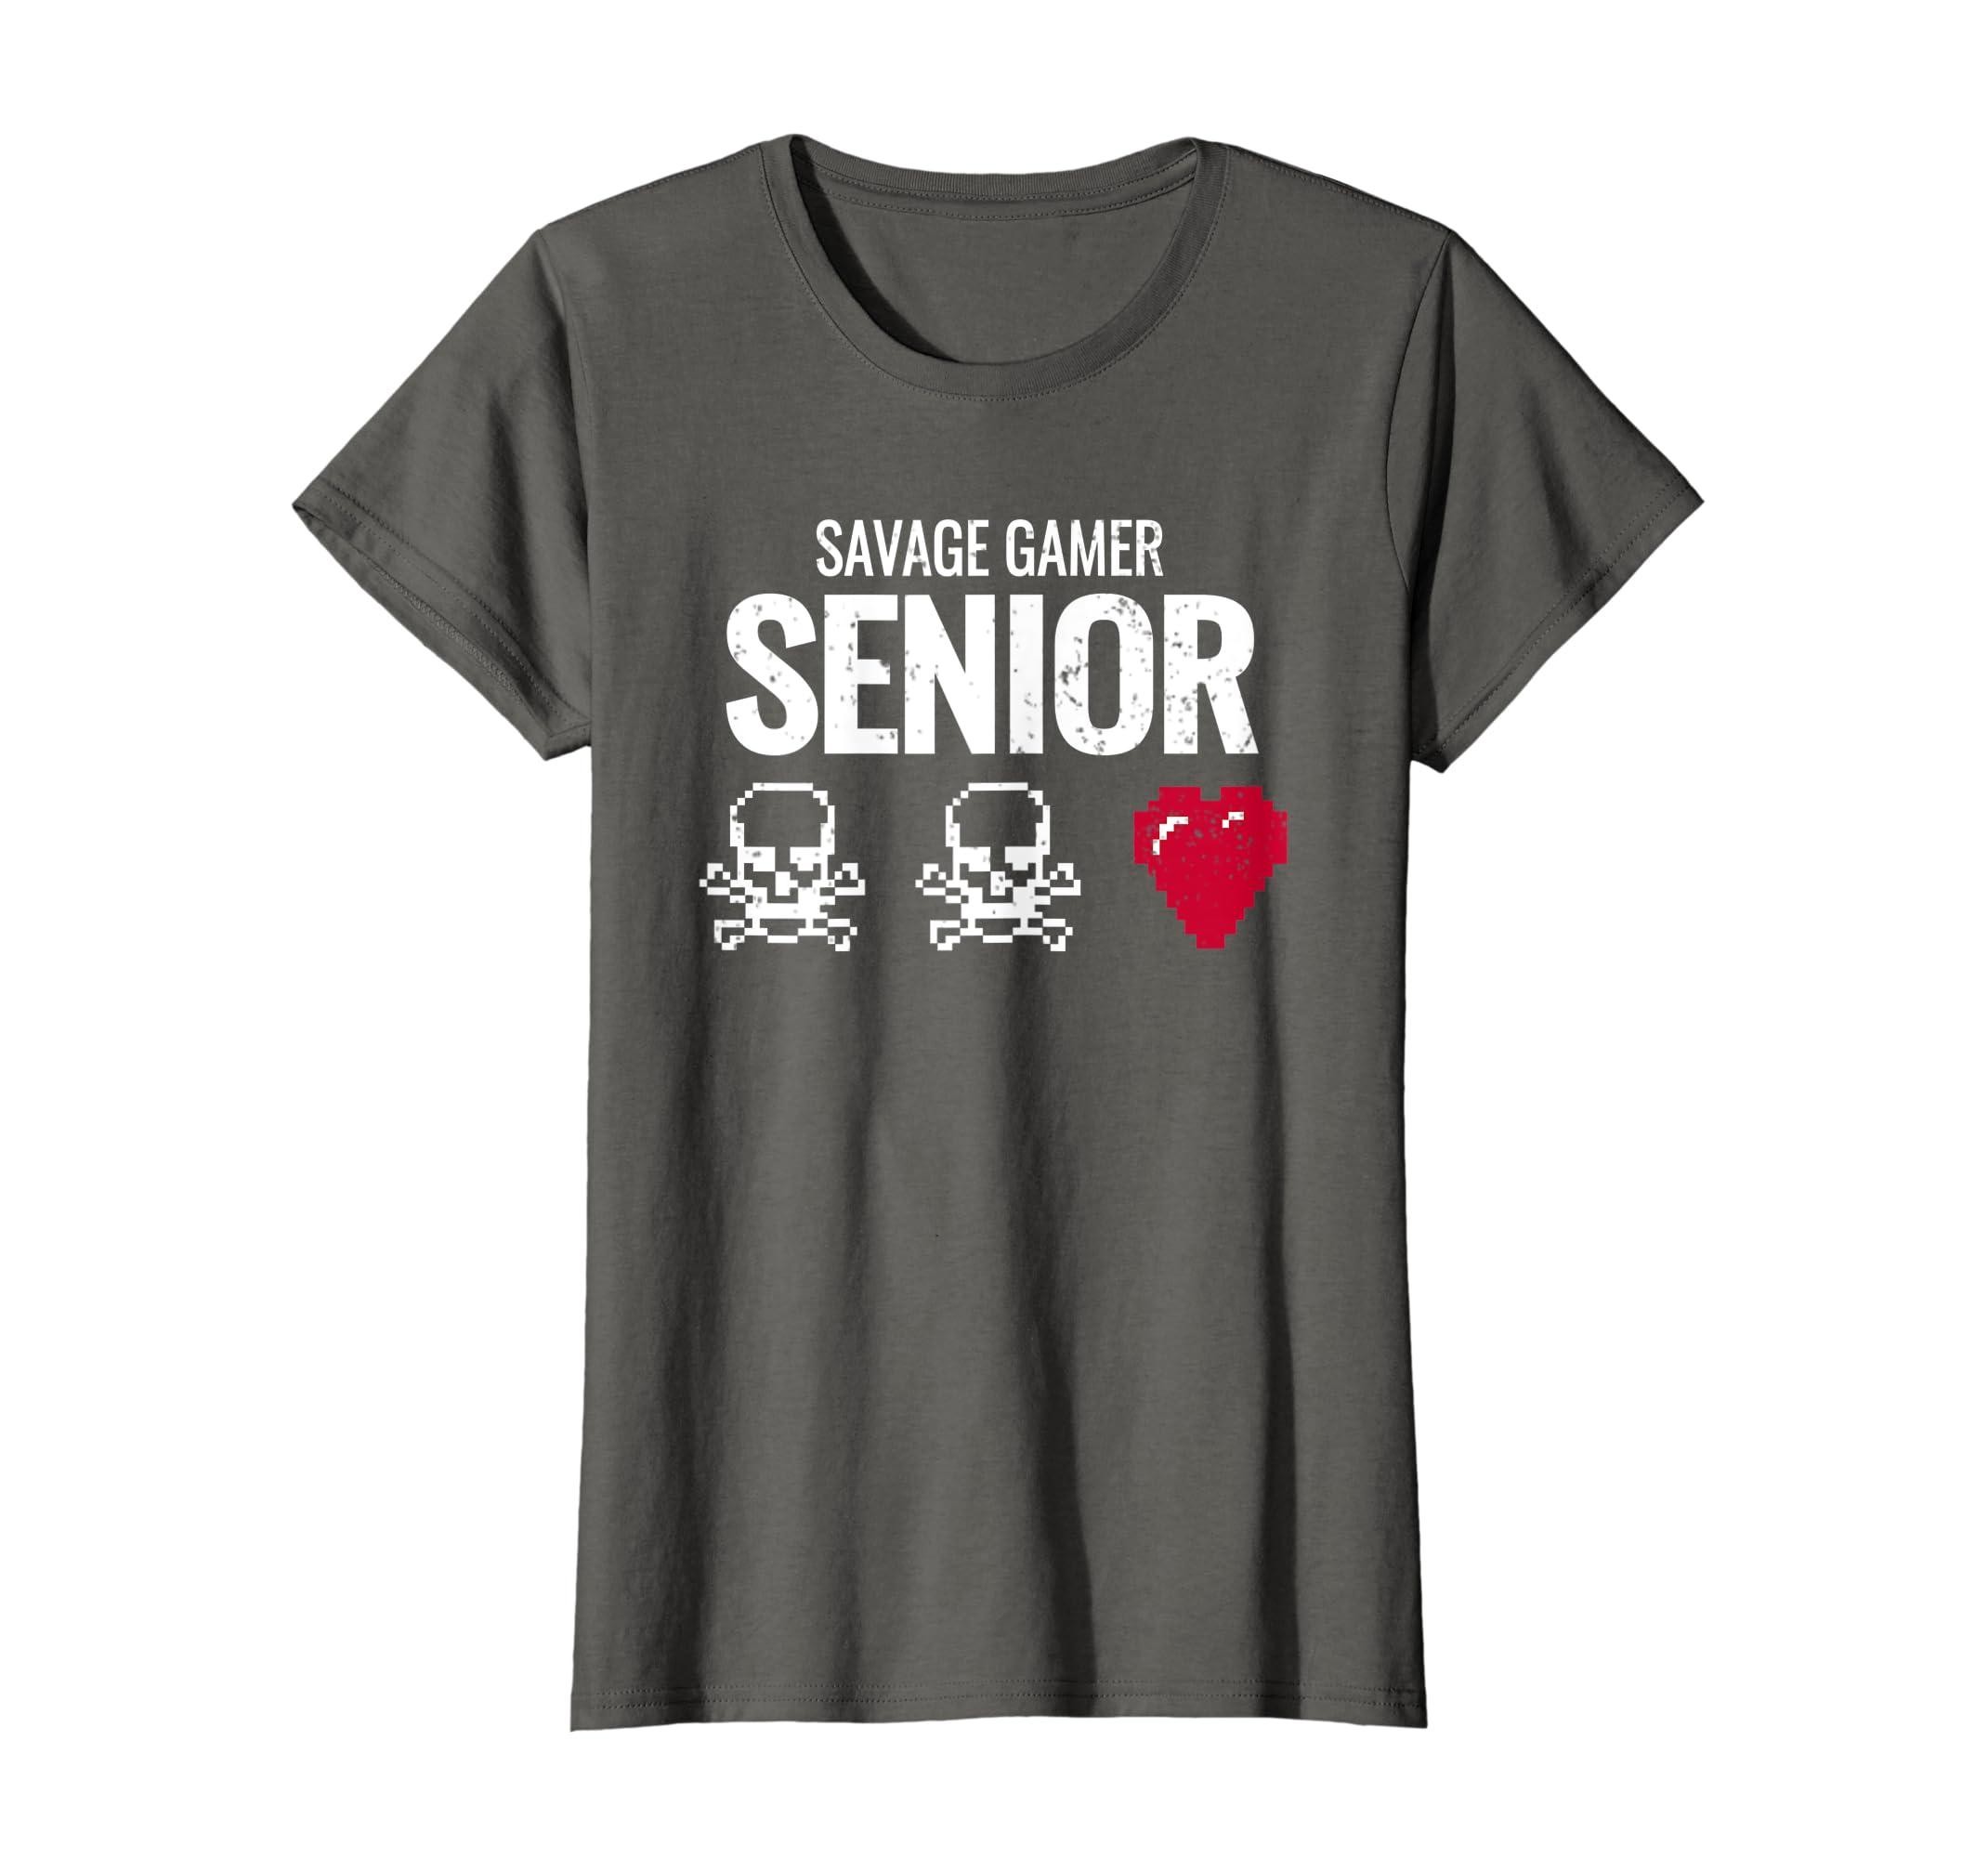 f68bd331017 Amazon.com  Funny Video Game T Shirt Women Men Savage Senior Gamer Gift   Clothing